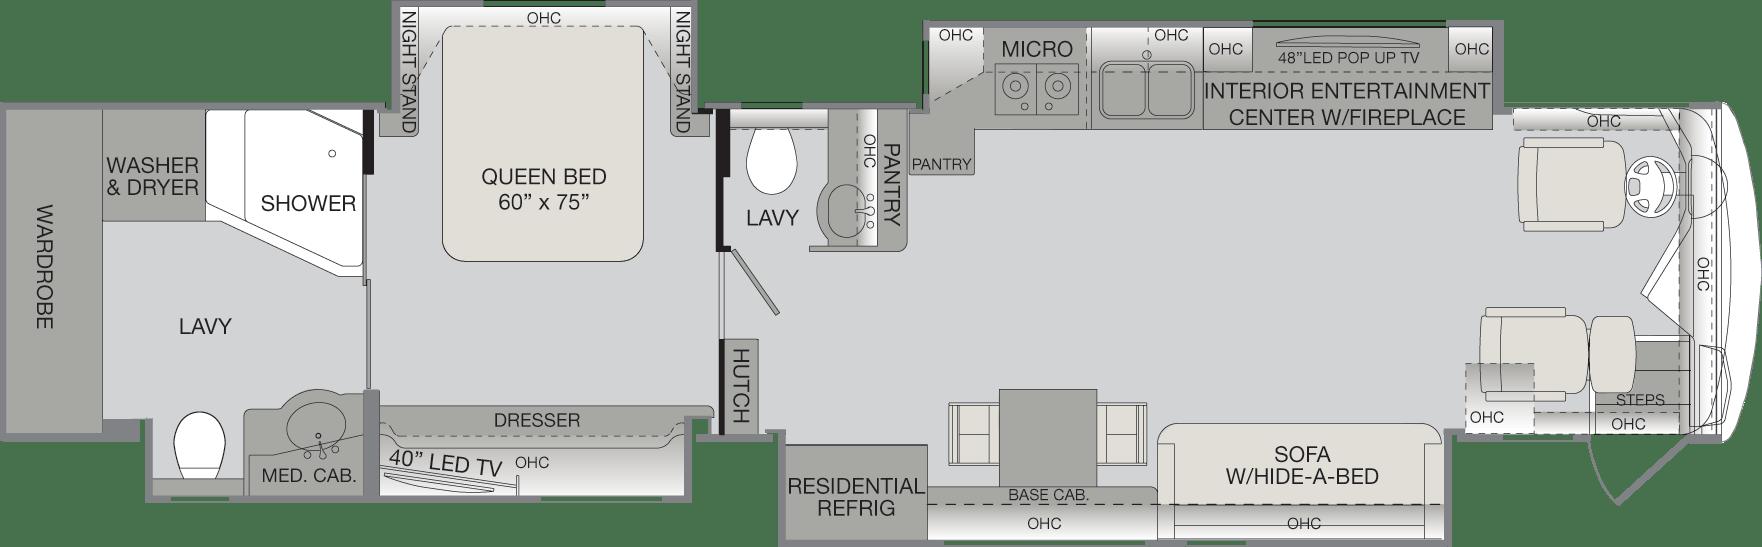 hight resolution of wiring diagram monaco motorhome fleetwood motorhome wiring diagram rh color castles com